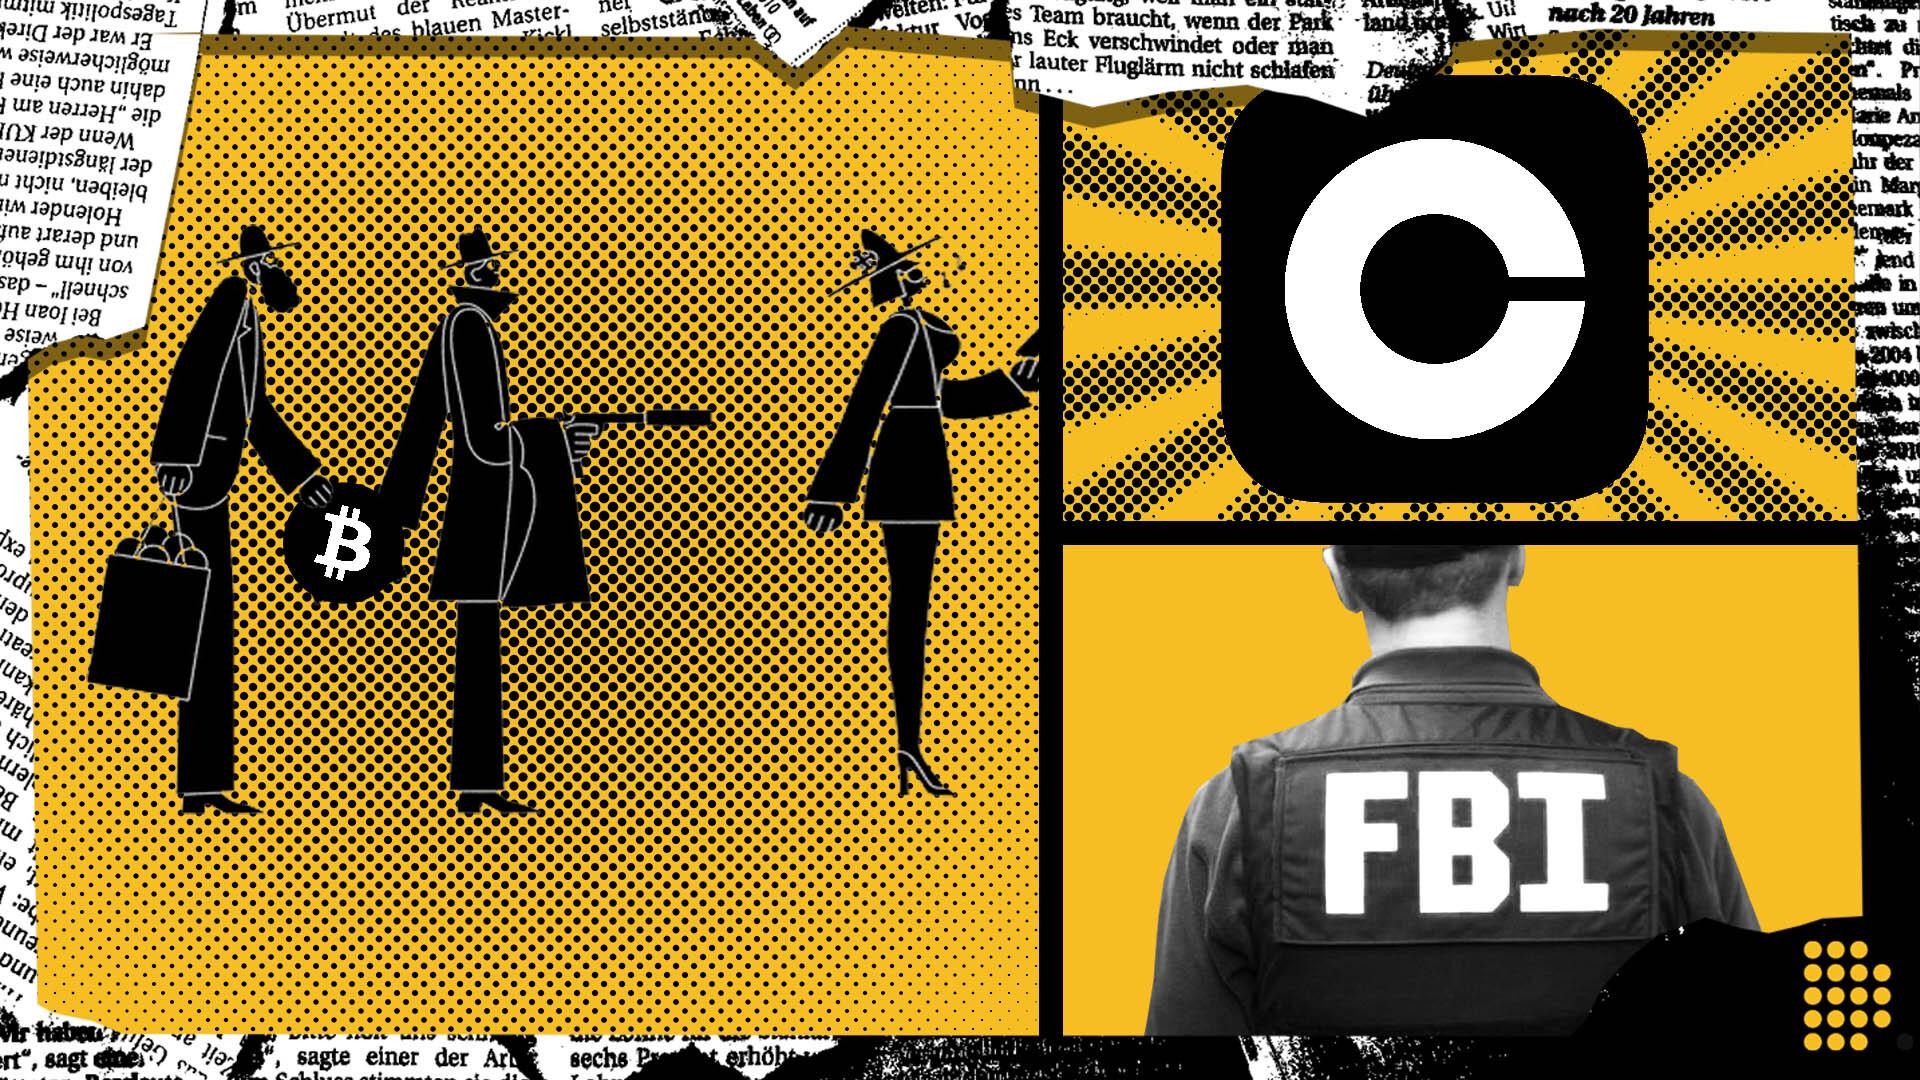 FBI crypto bitcoin